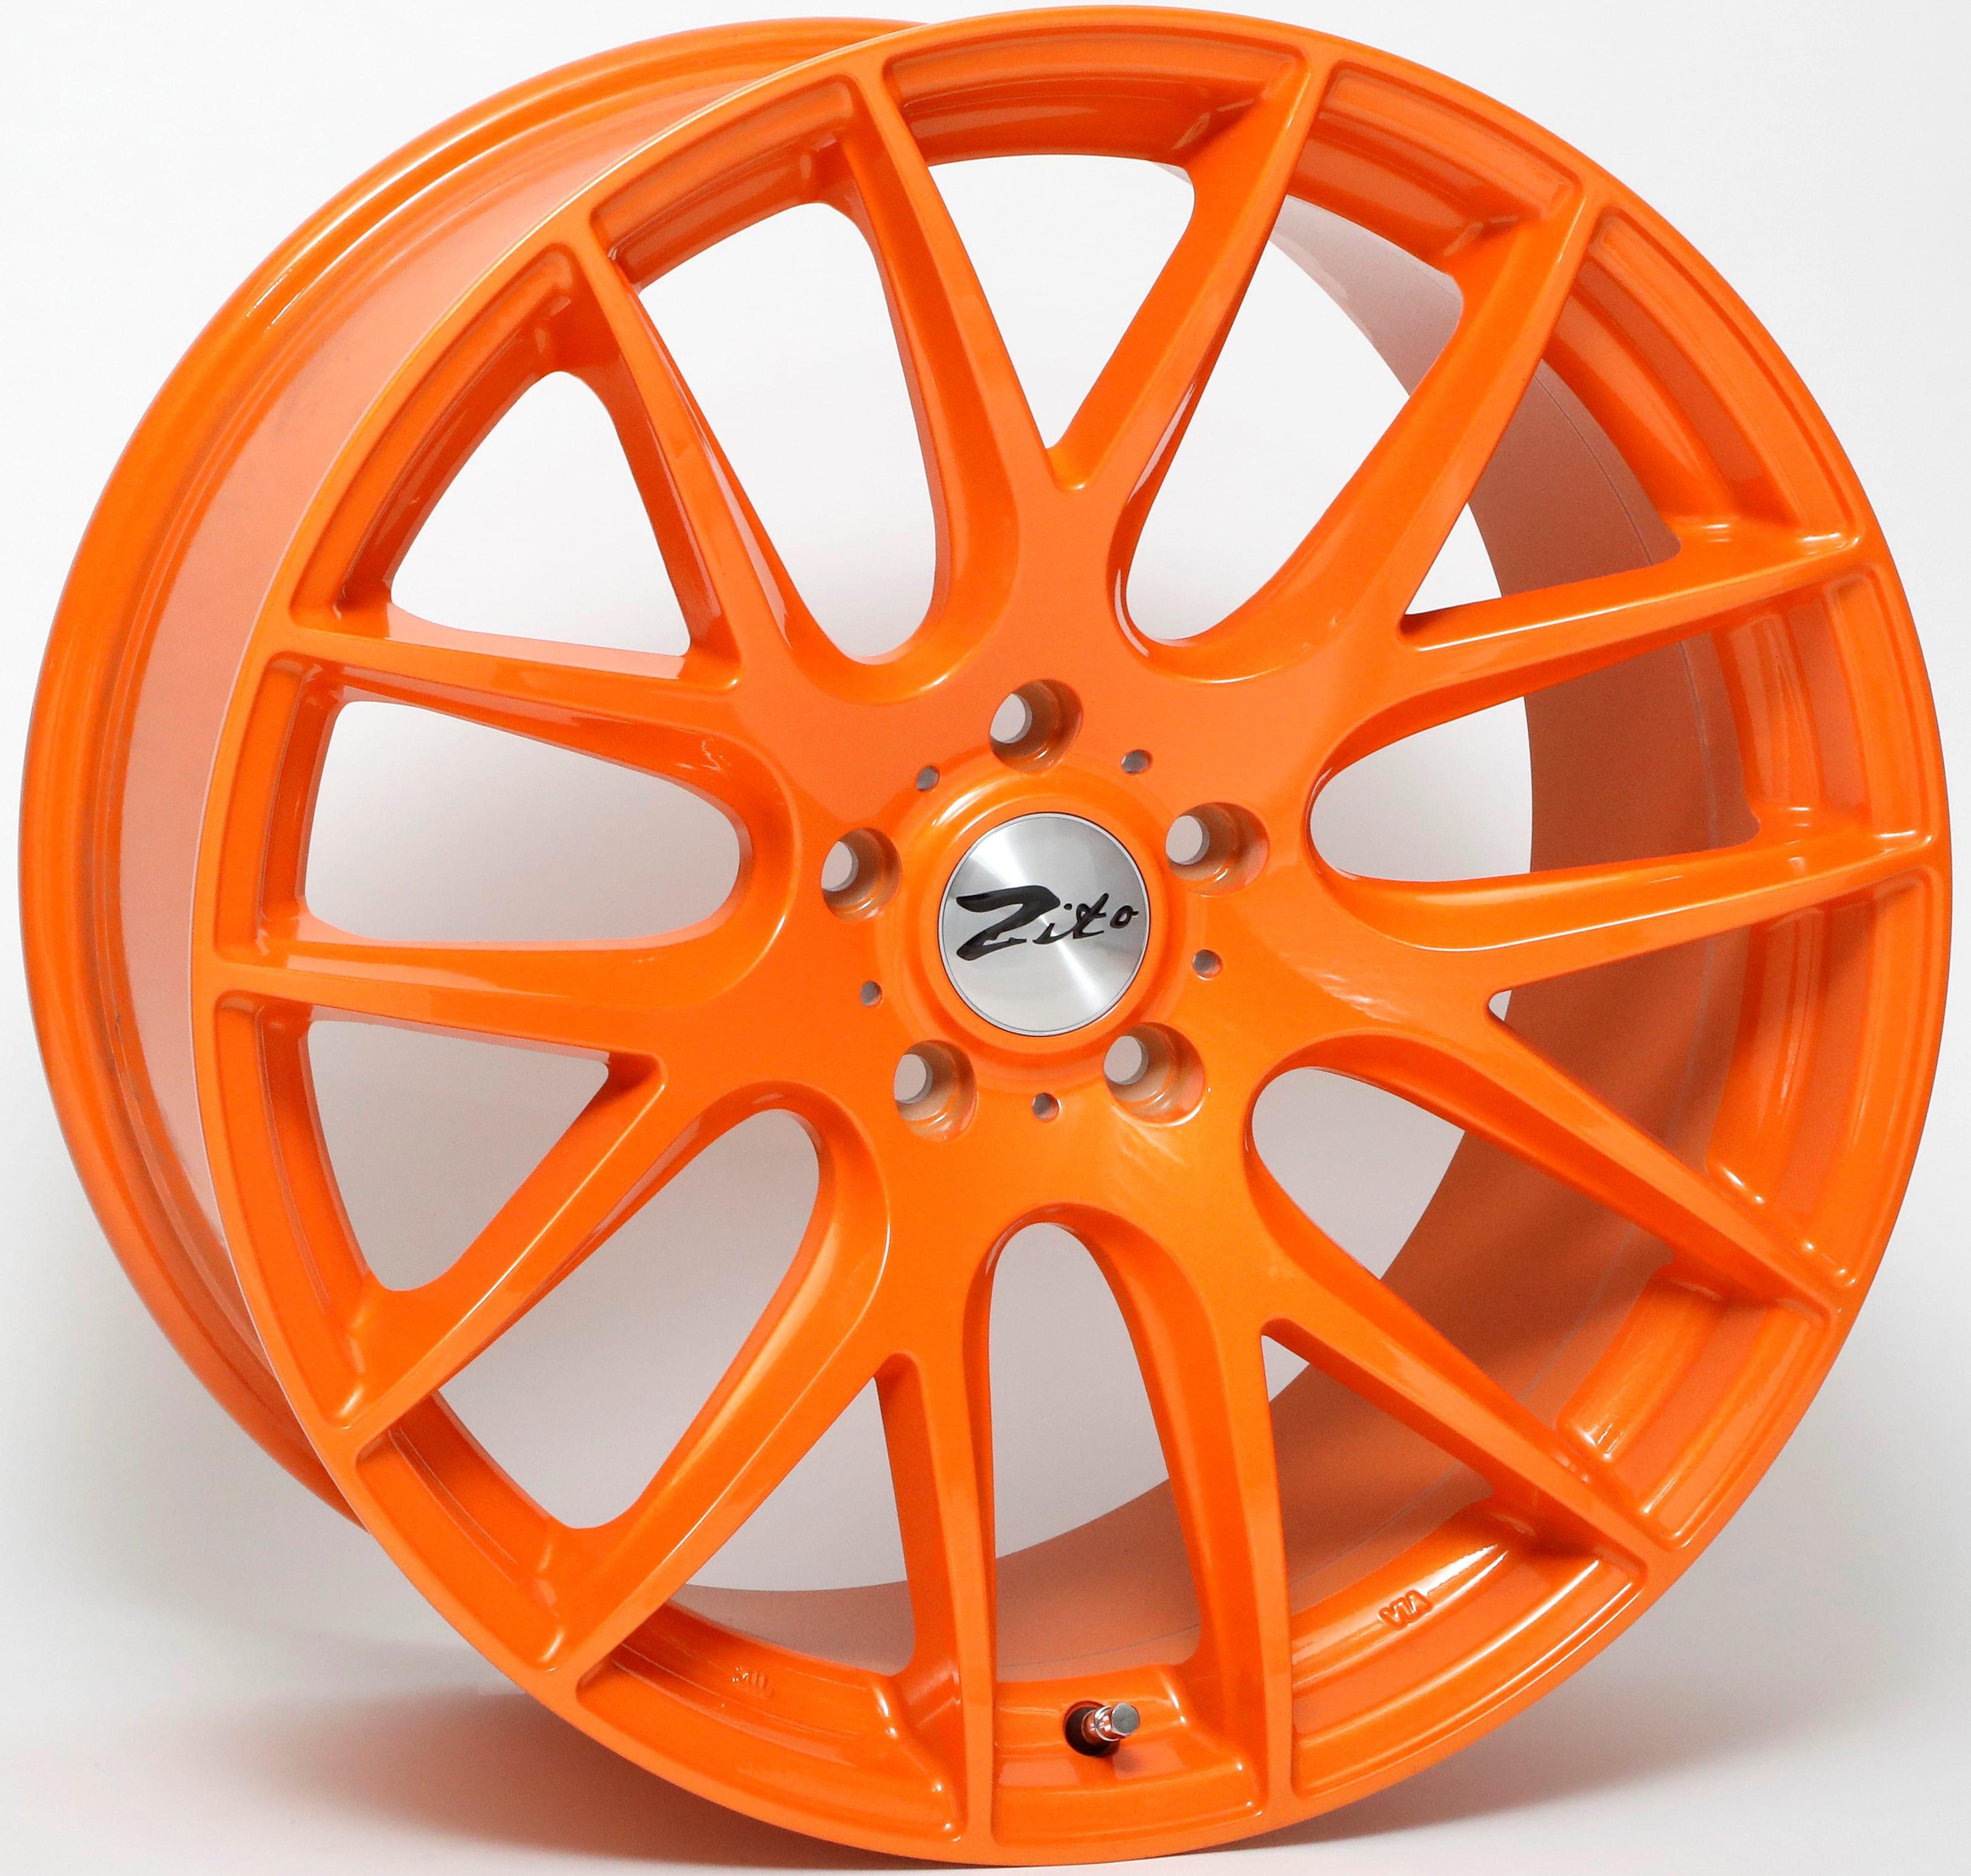 Zito - 935 (Orange)